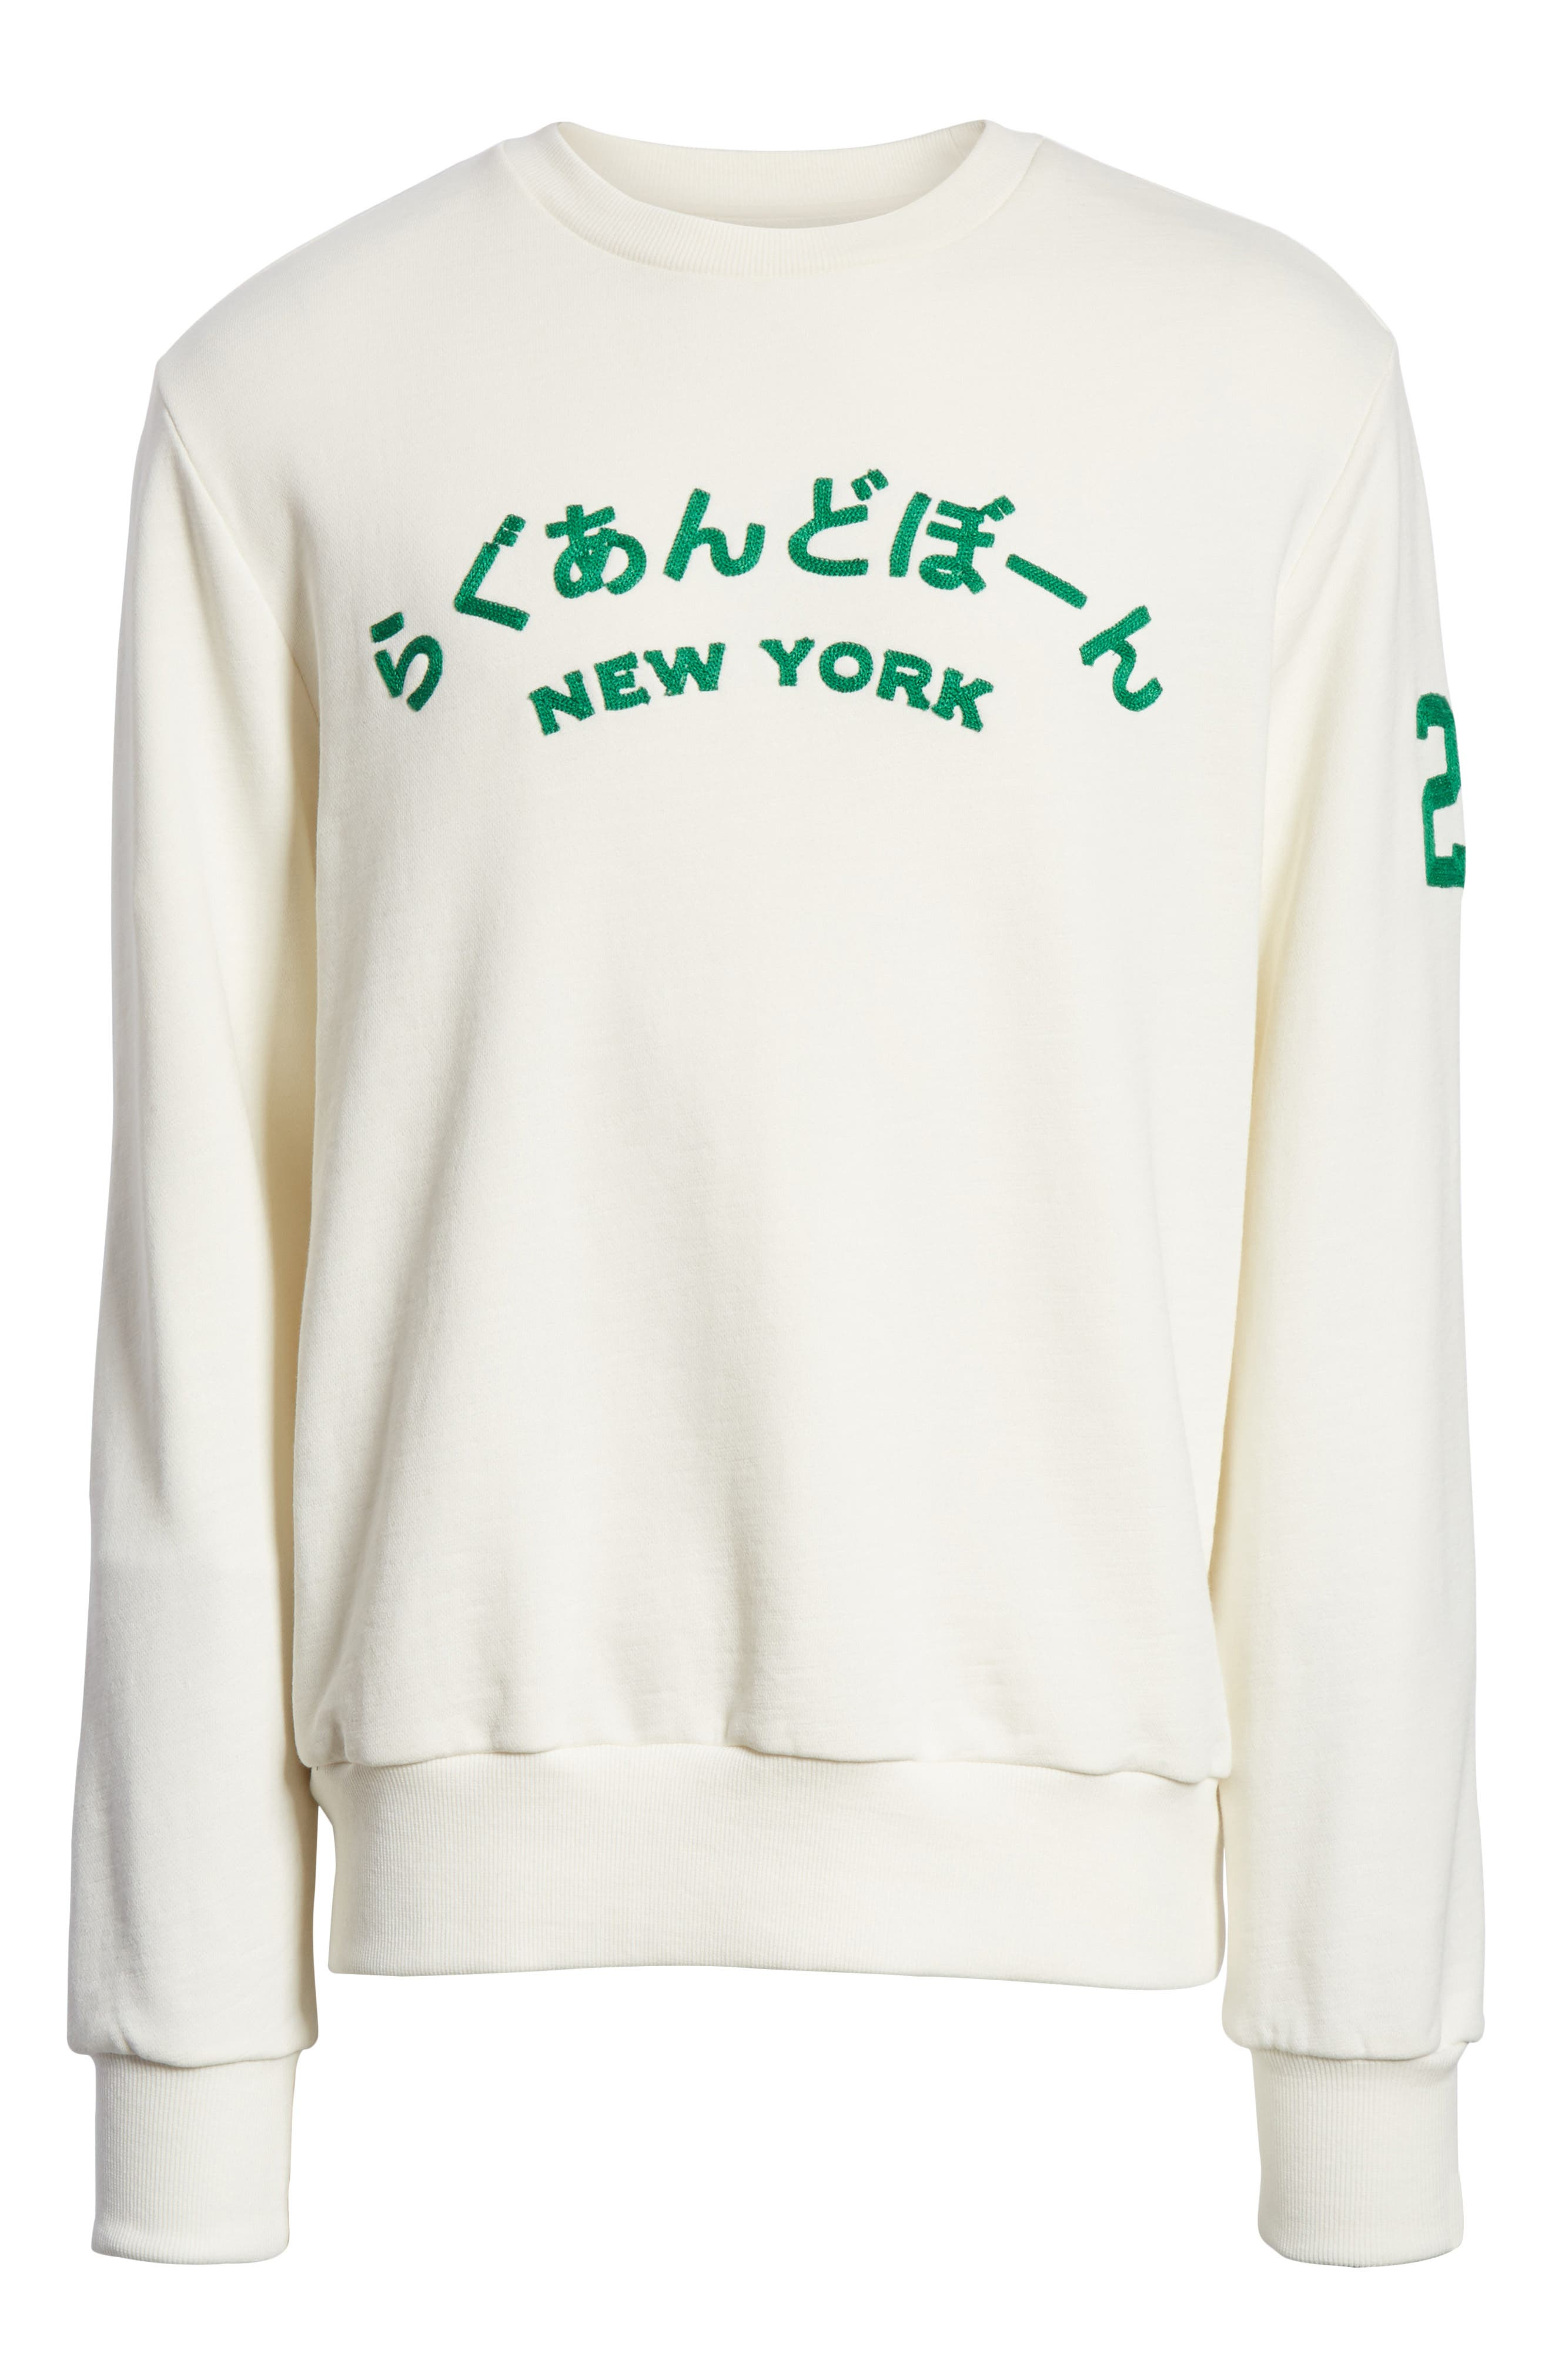 Japan Embroidered Crewneck Sweatshirt,                             Alternate thumbnail 6, color,                             900